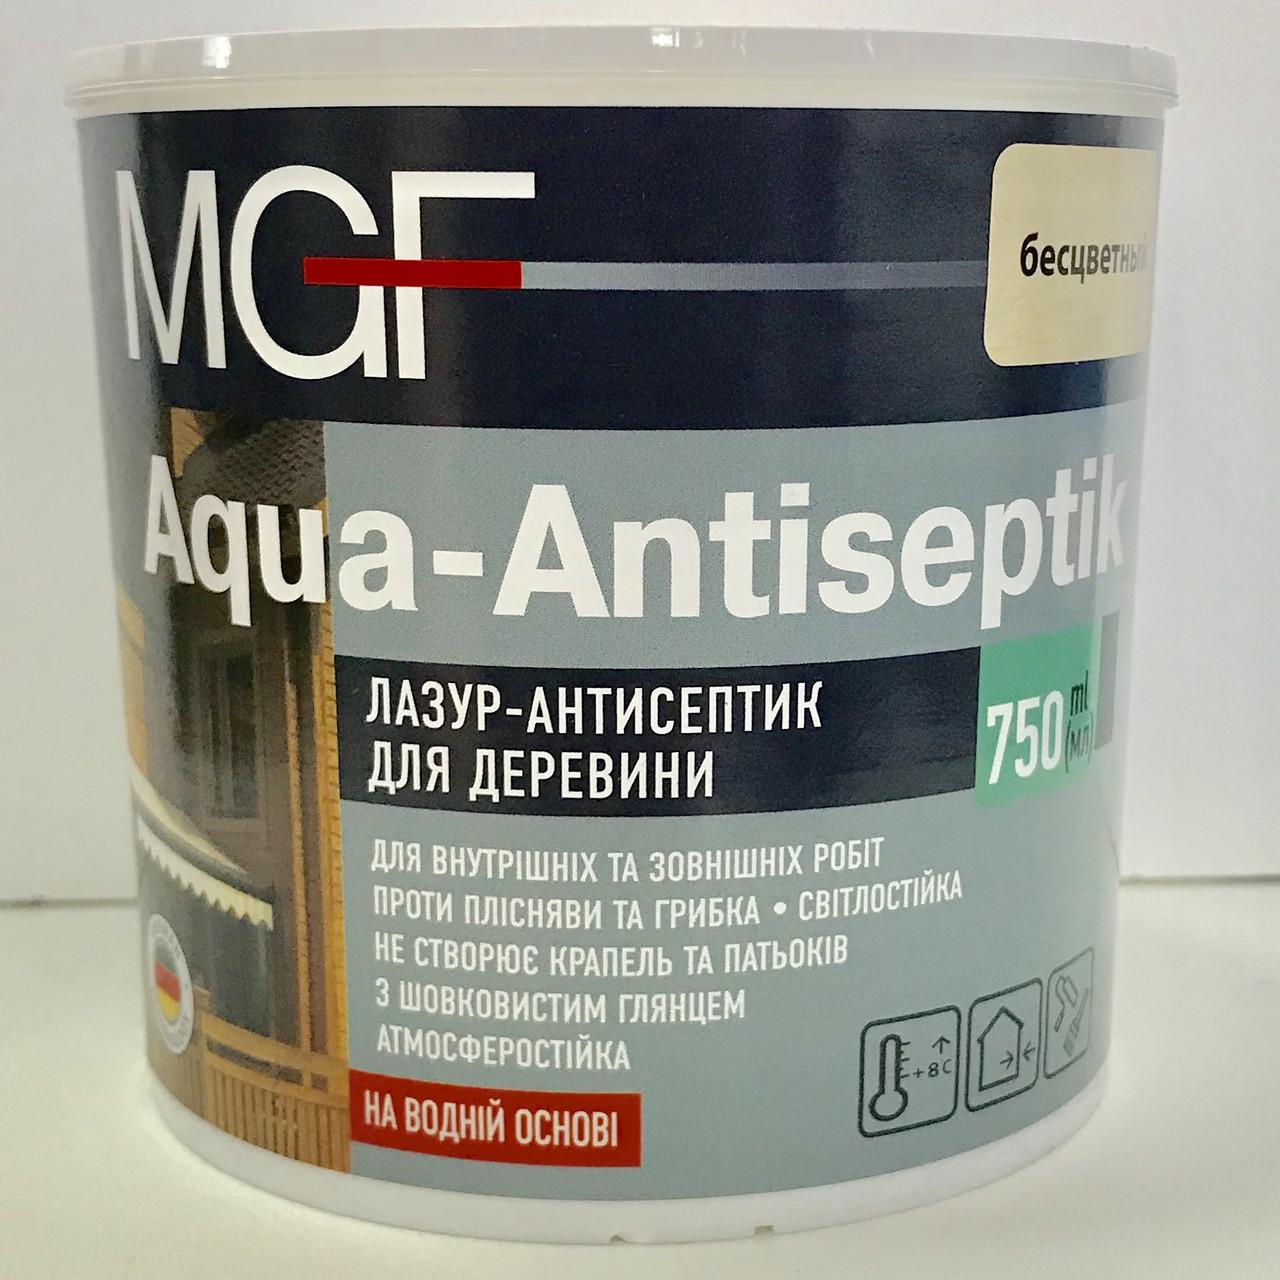 Лазурь-антисептик для дерева MGF AQUA-ANTISEPTIK 0,75л